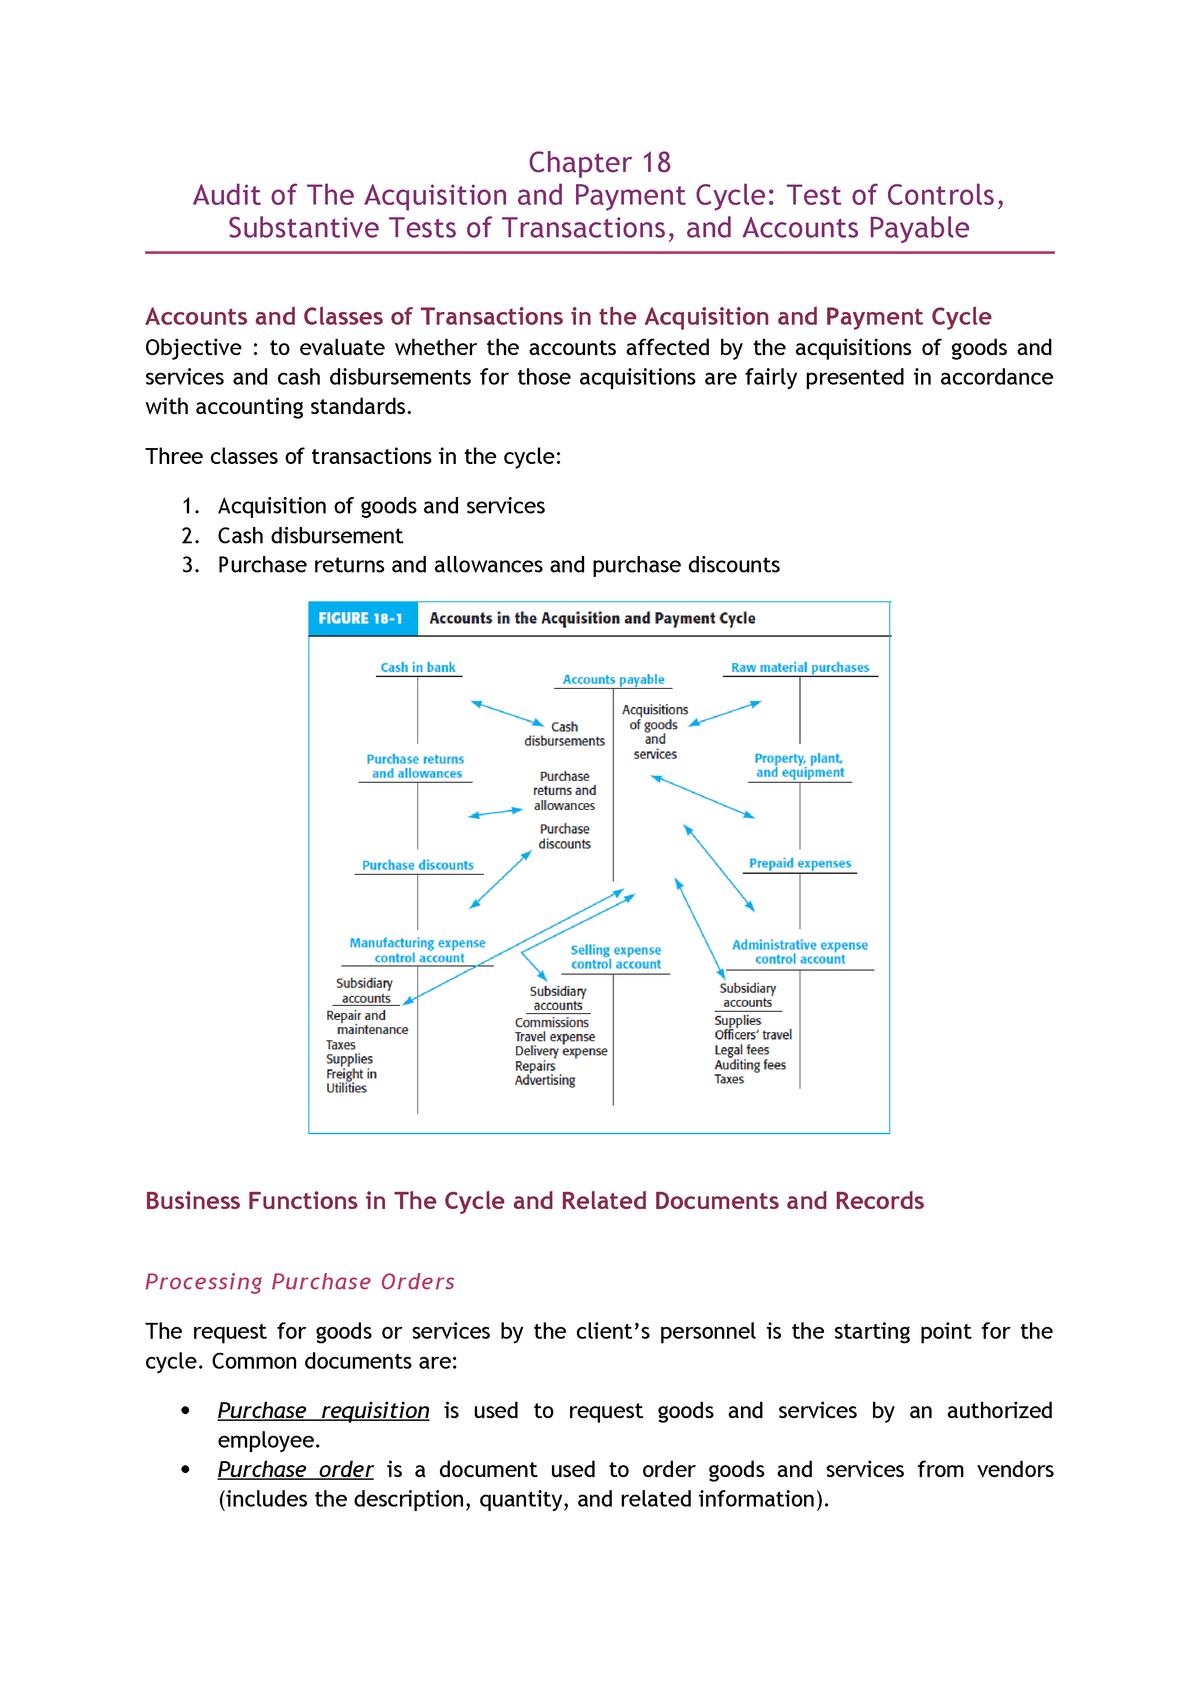 Deficiencies in purchasing cycle